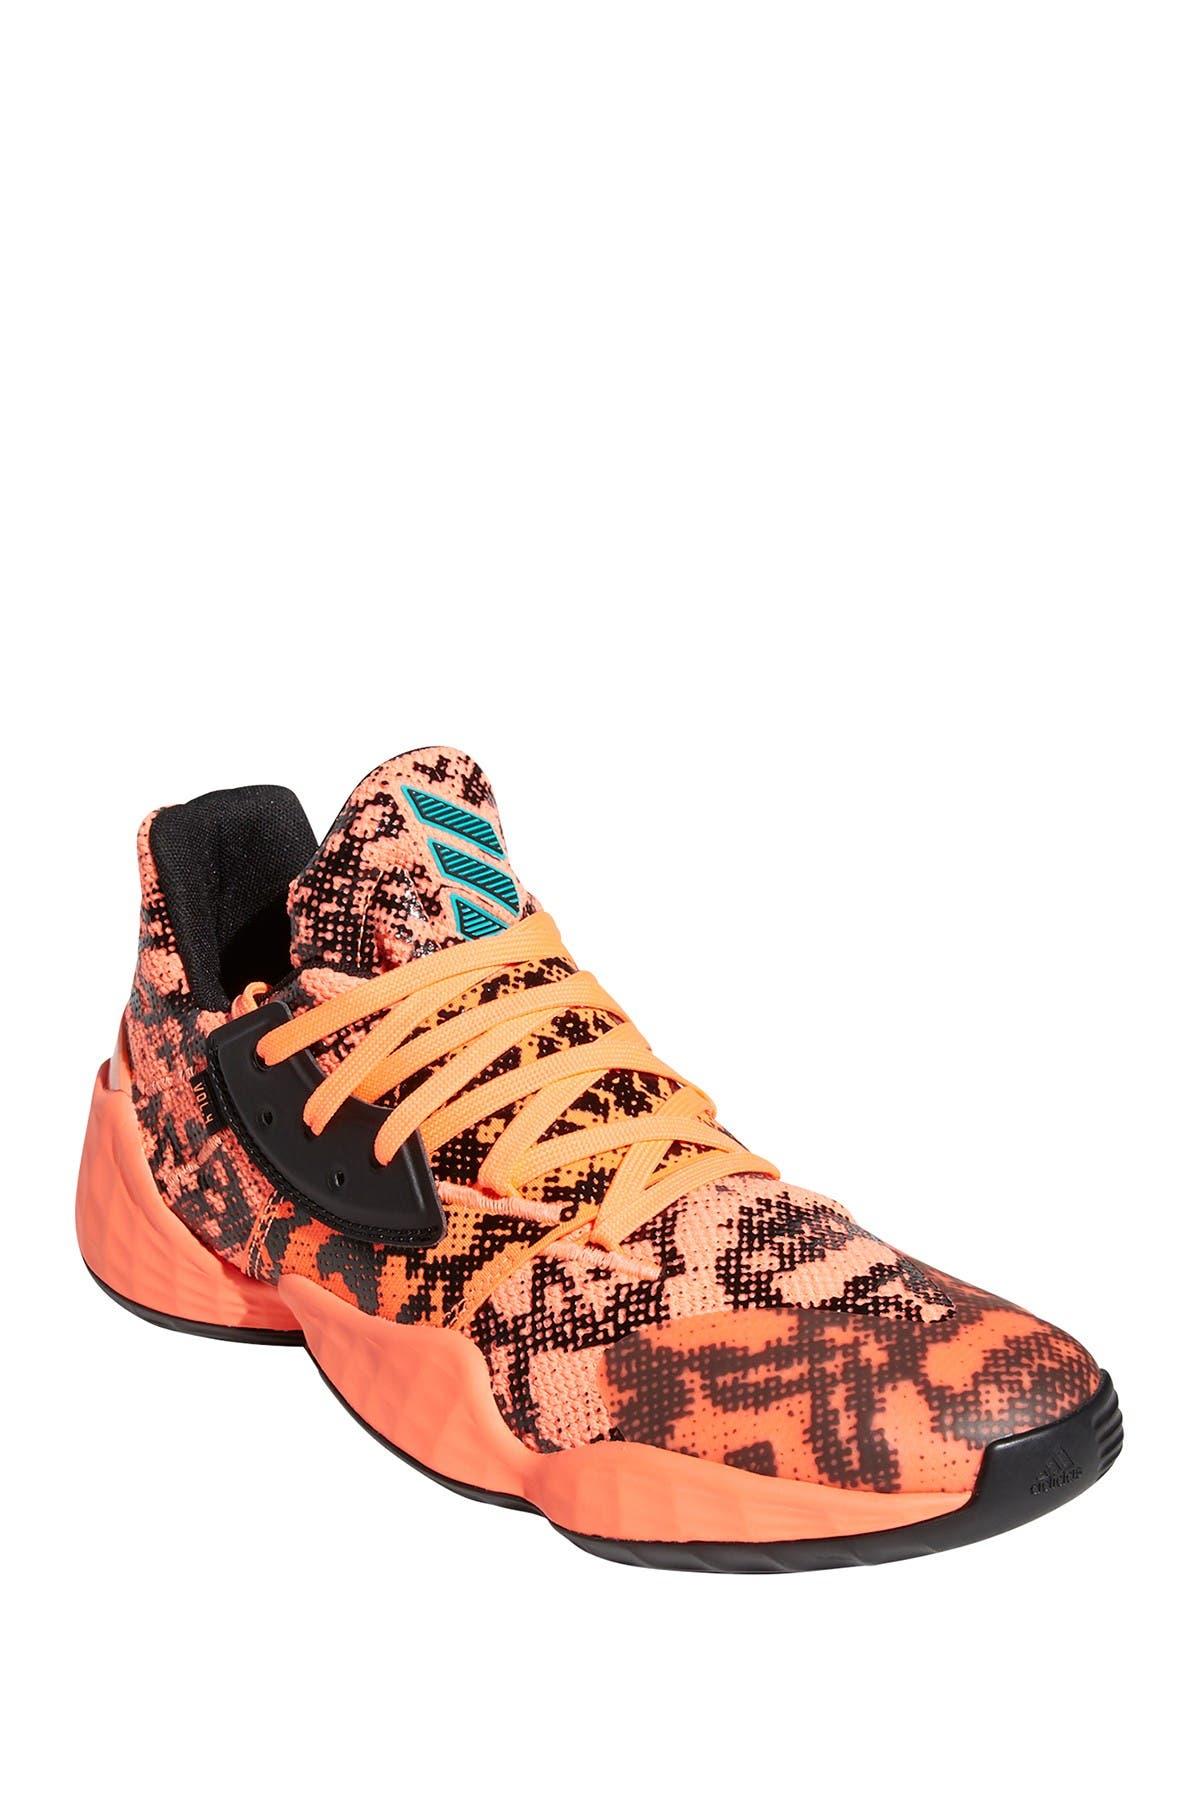 Image of adidas Harden Vol. 4 Basketball Shoe